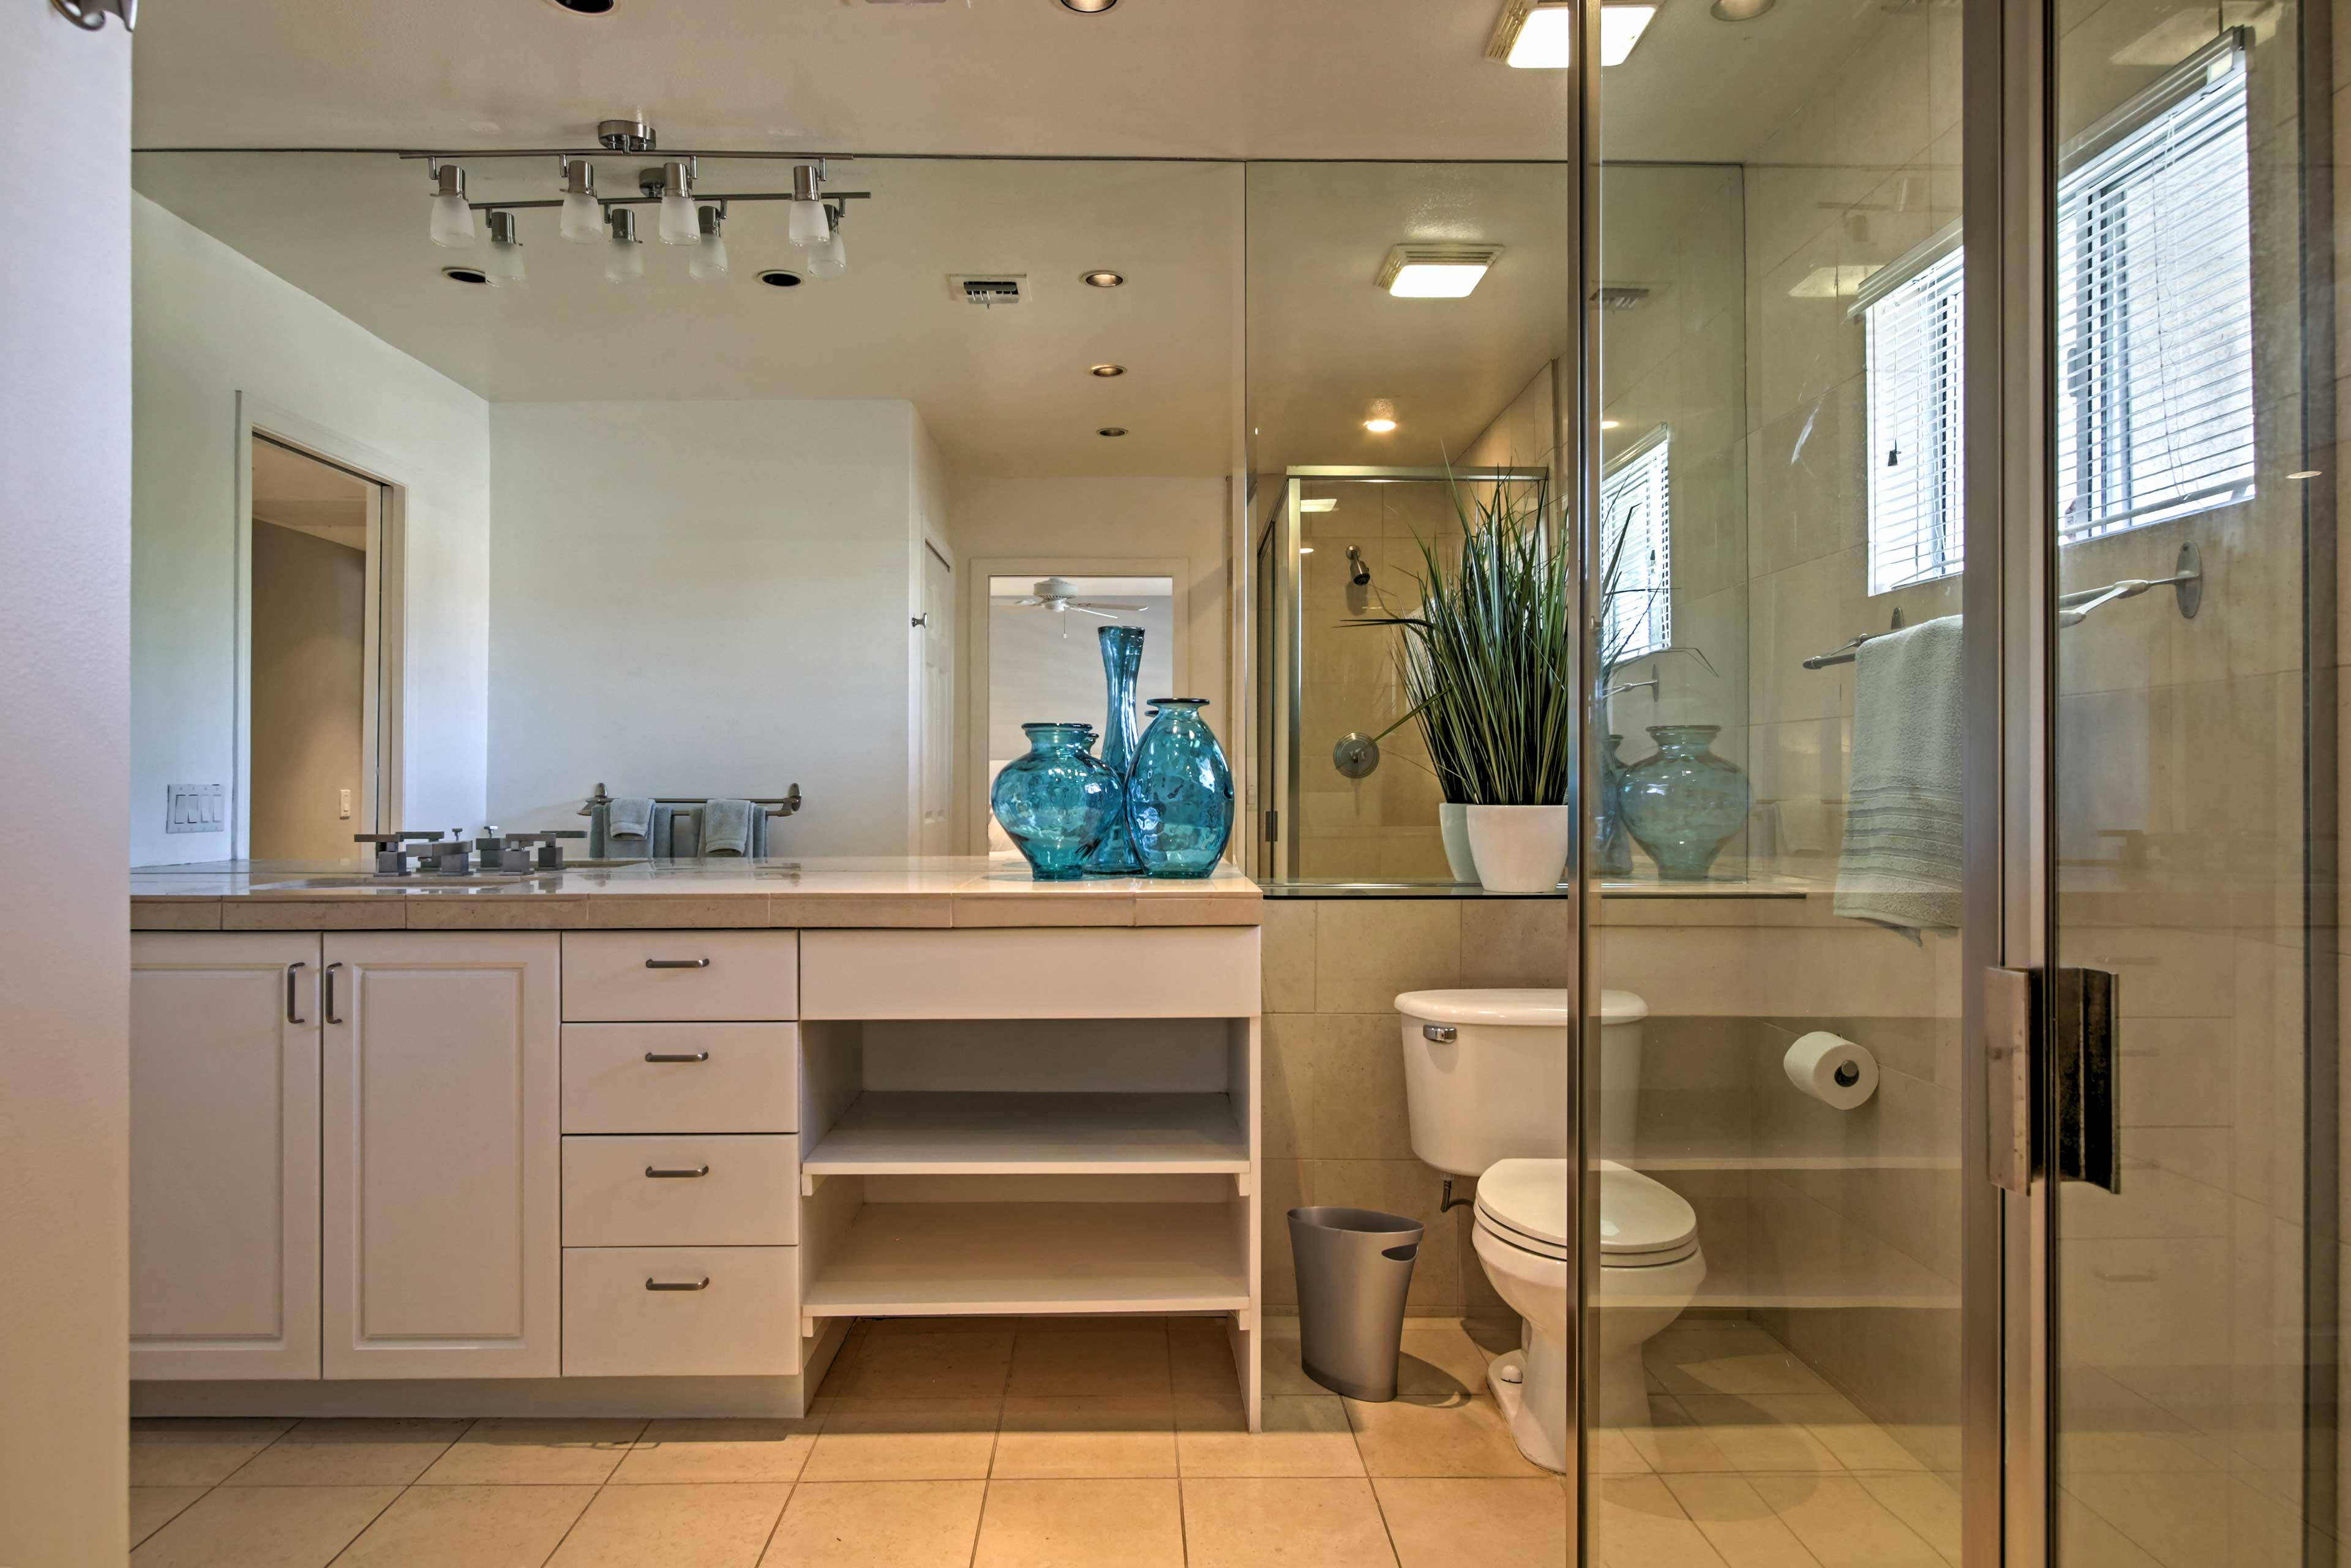 Each bathroom offer a slick and sleek design.